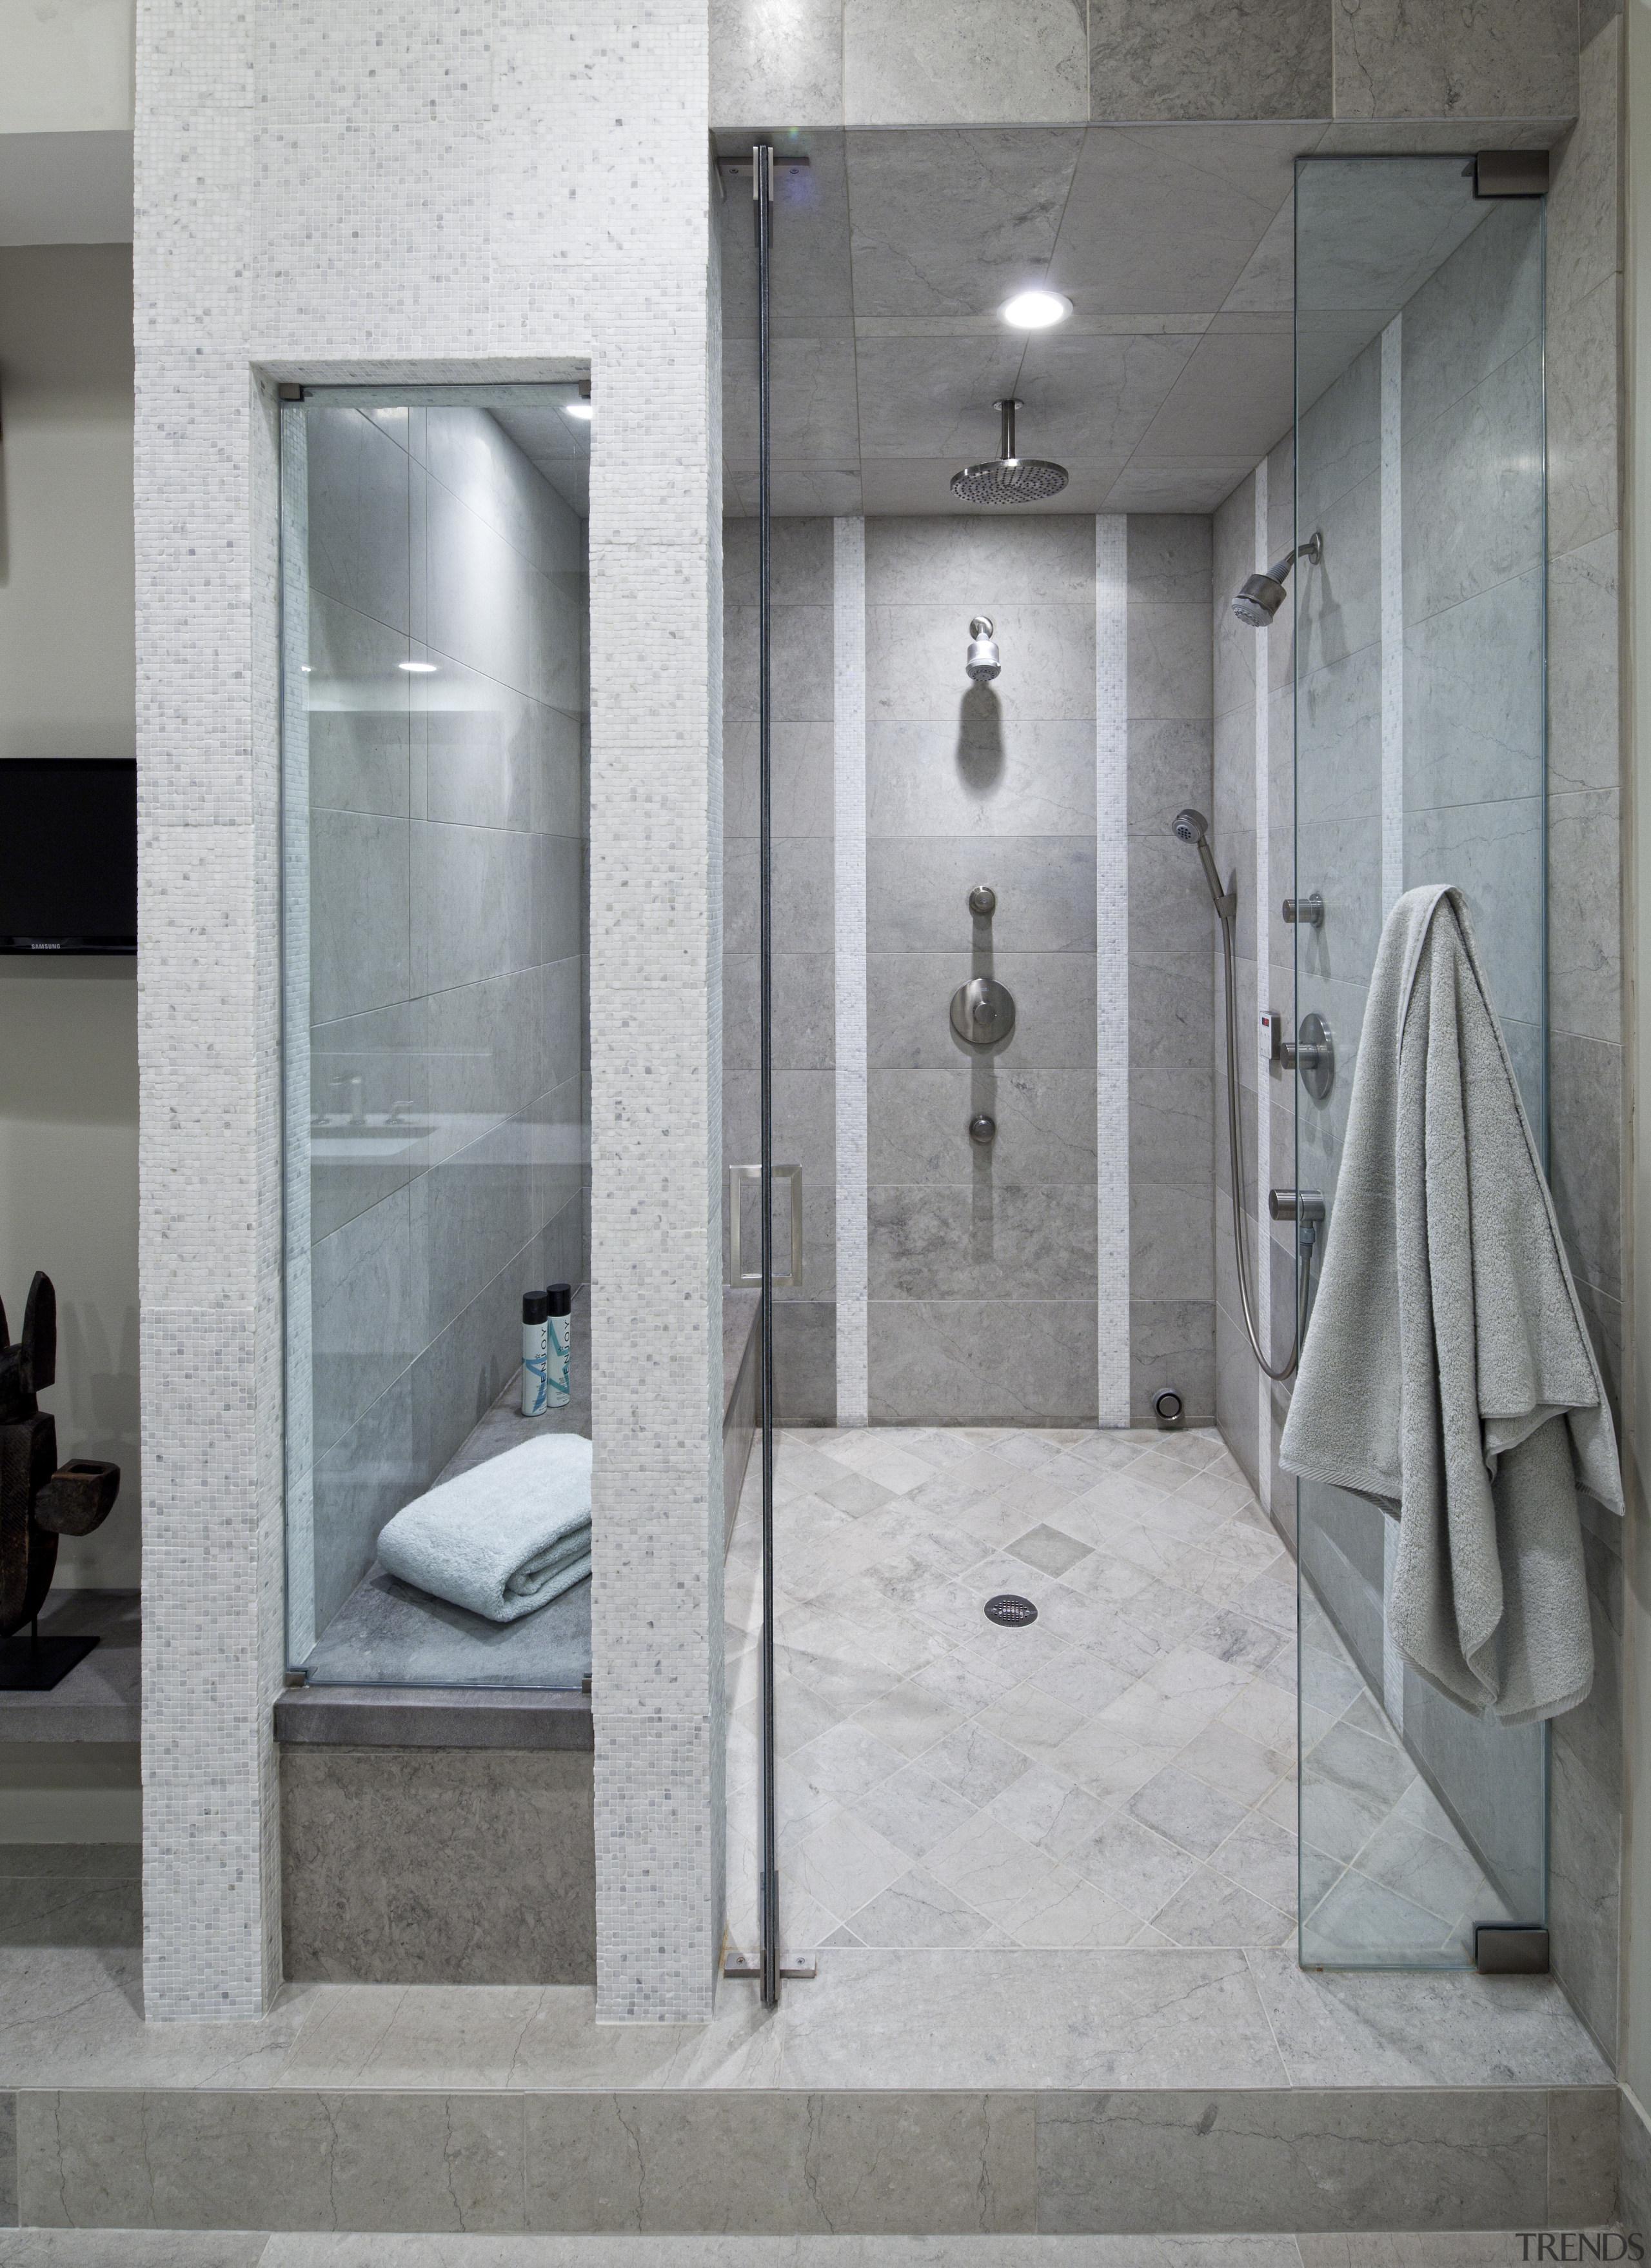 To add interest to this new shower area, bathroom, floor, interior design, plumbing fixture, room, shower, tile, gray